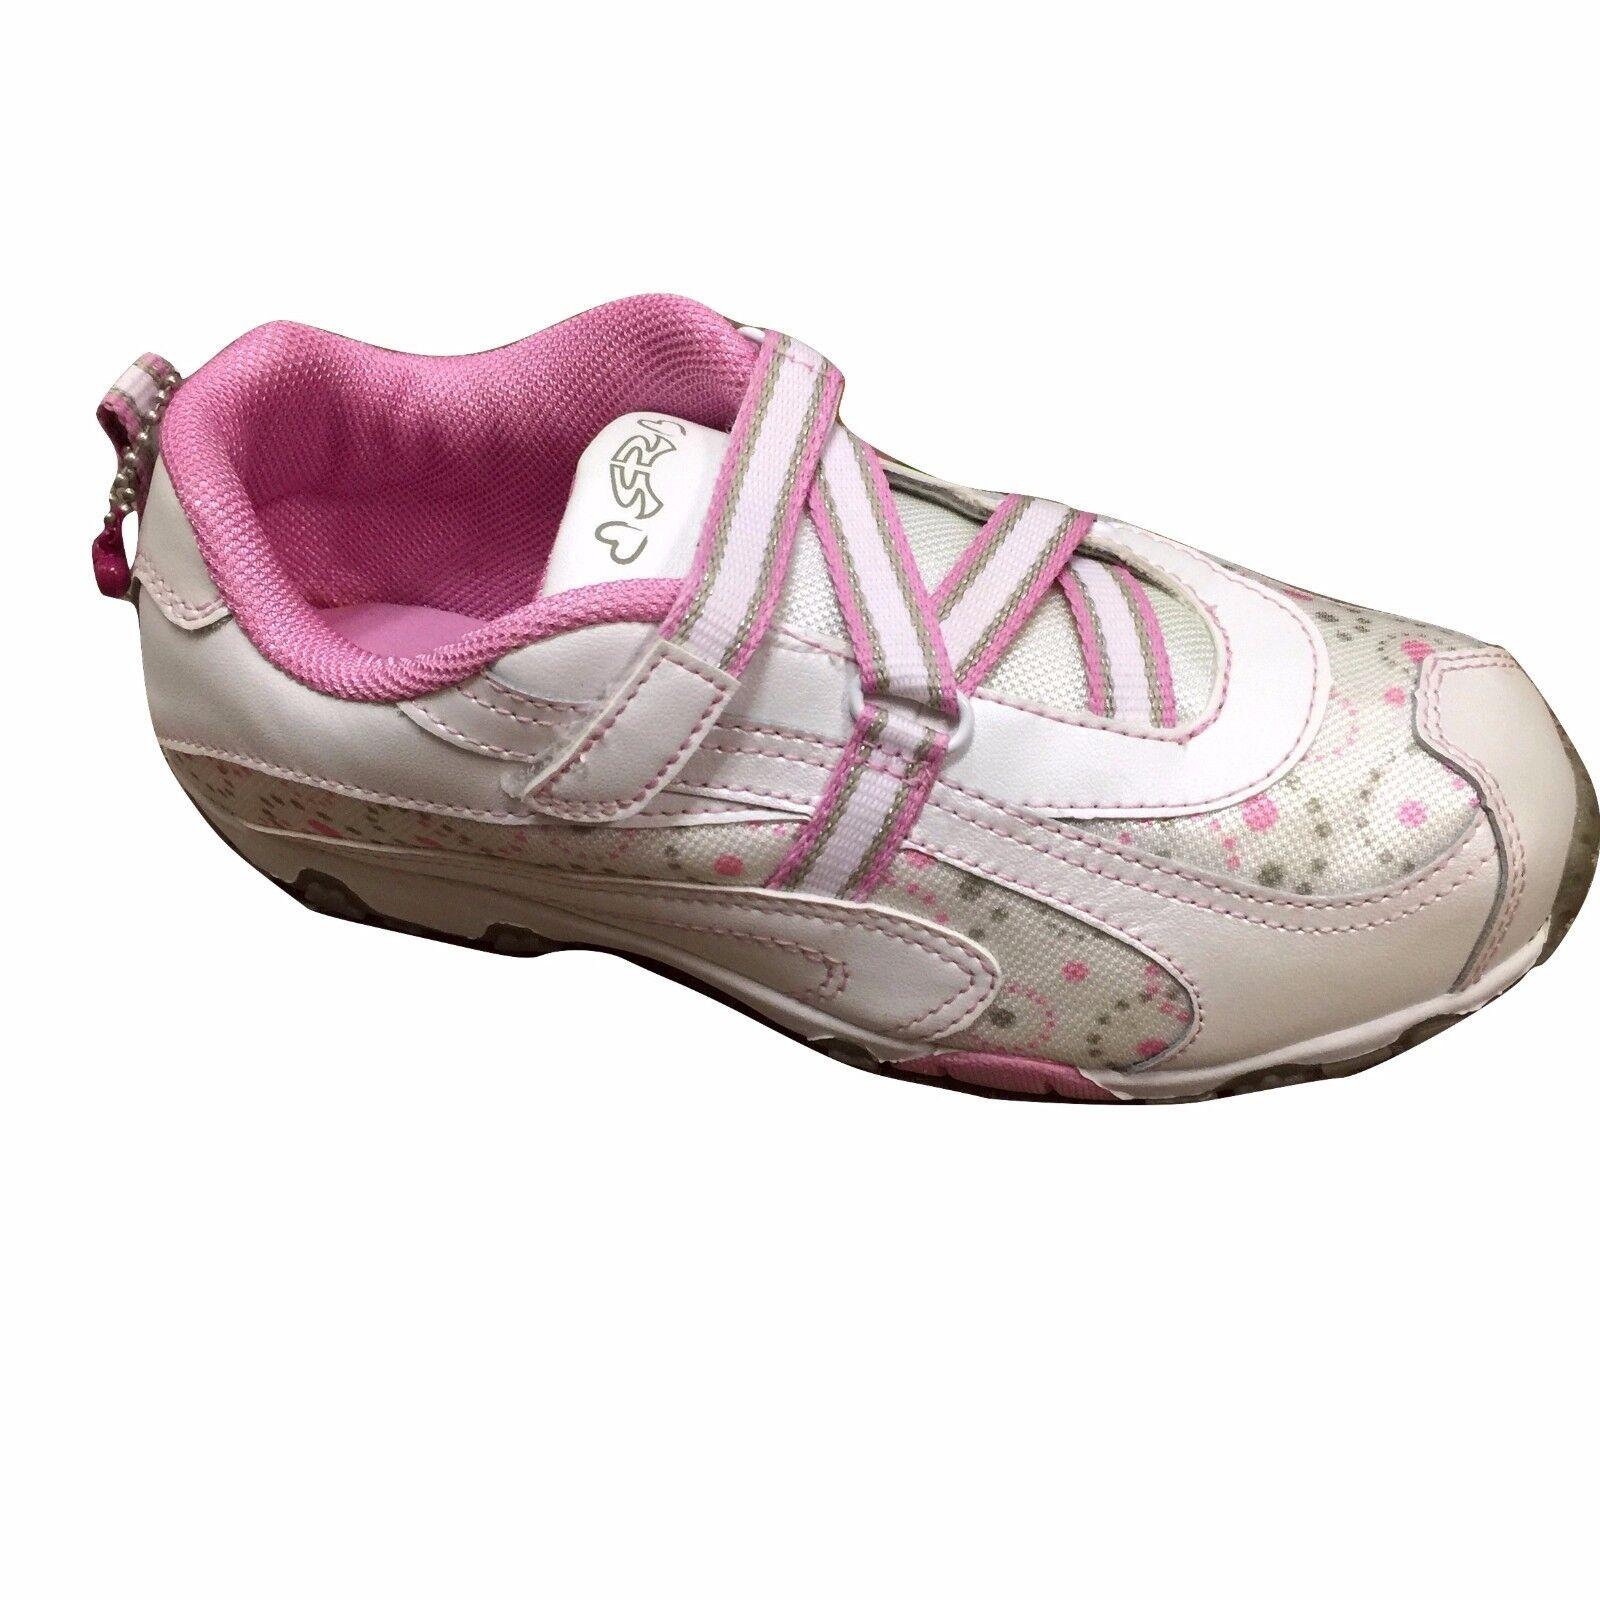 Girls Children's STRIDE RITE Ashley WHITE/PIINK leather shoe